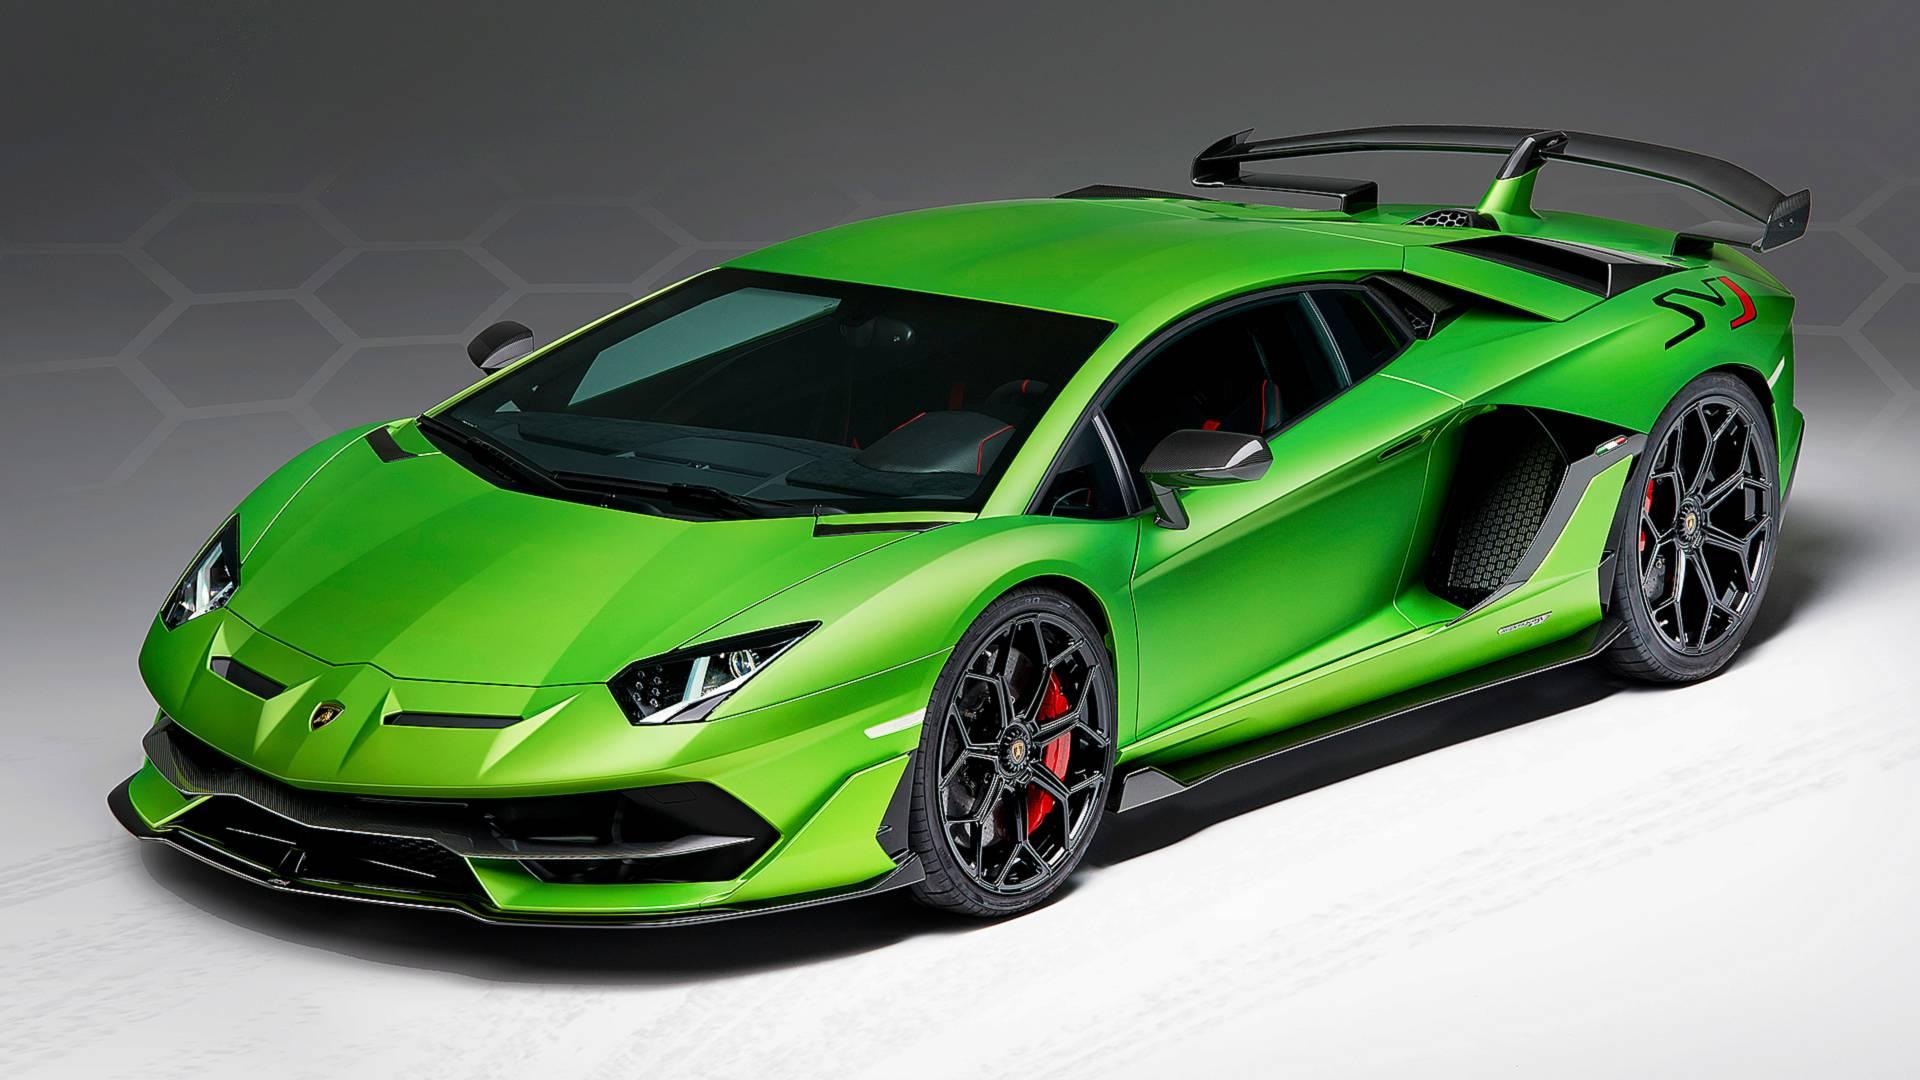 Cars For Uber >> Lamborghini Aventador SVJ Looks Complicated in Live Footage - autoevolution